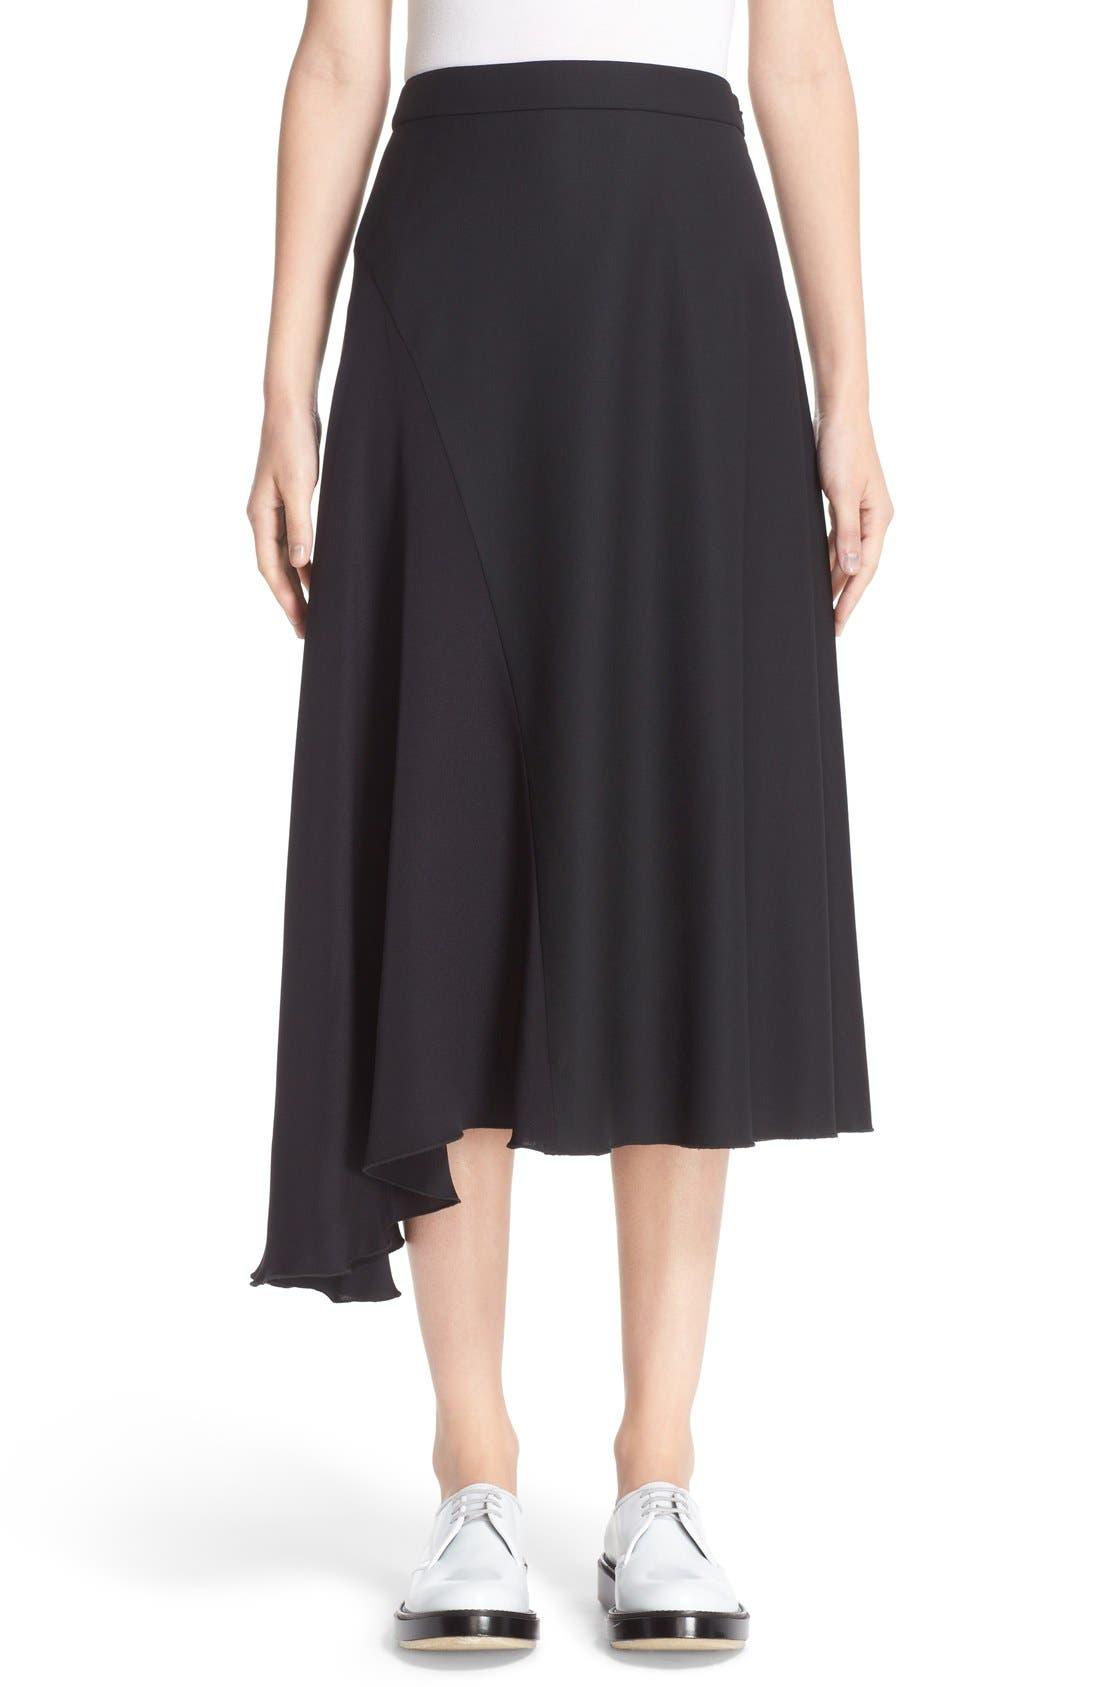 Colovos Seasonless Asymmetrical Midi Skirt